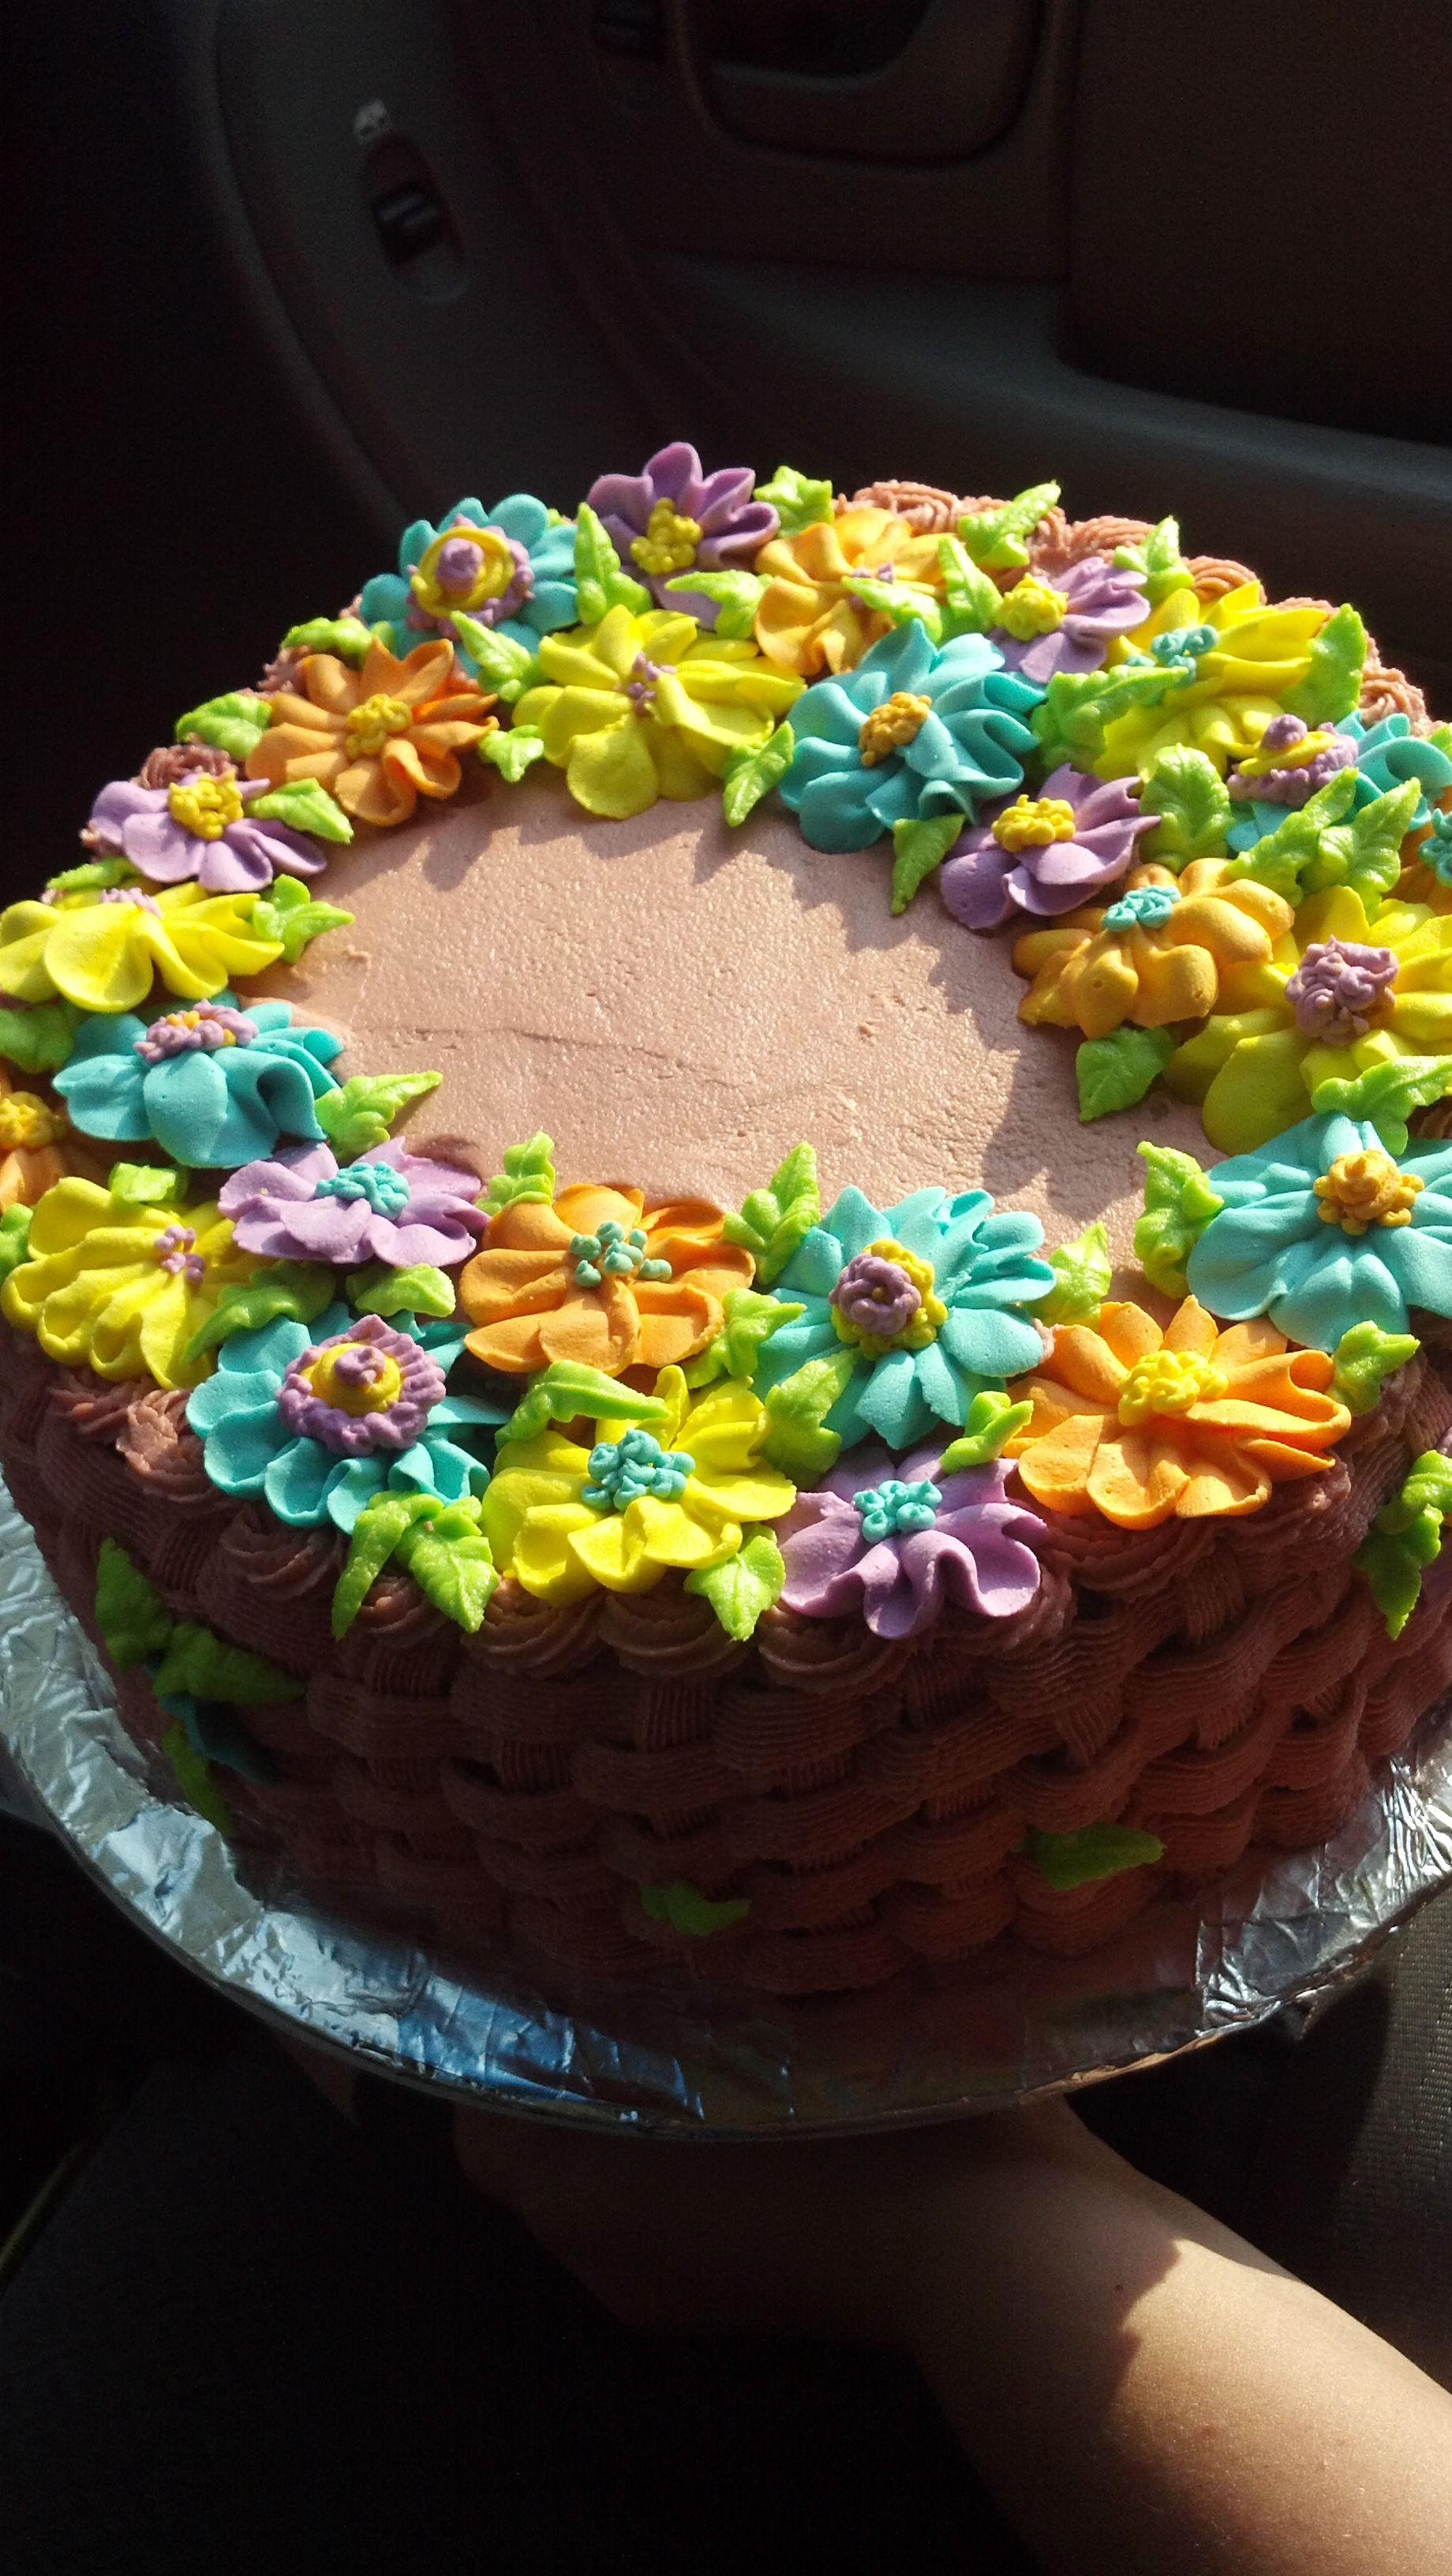 Cake With Royal Icing Flowers : Basket cake - Royal Icing Flowers ? Cakes, Cakes & More ...